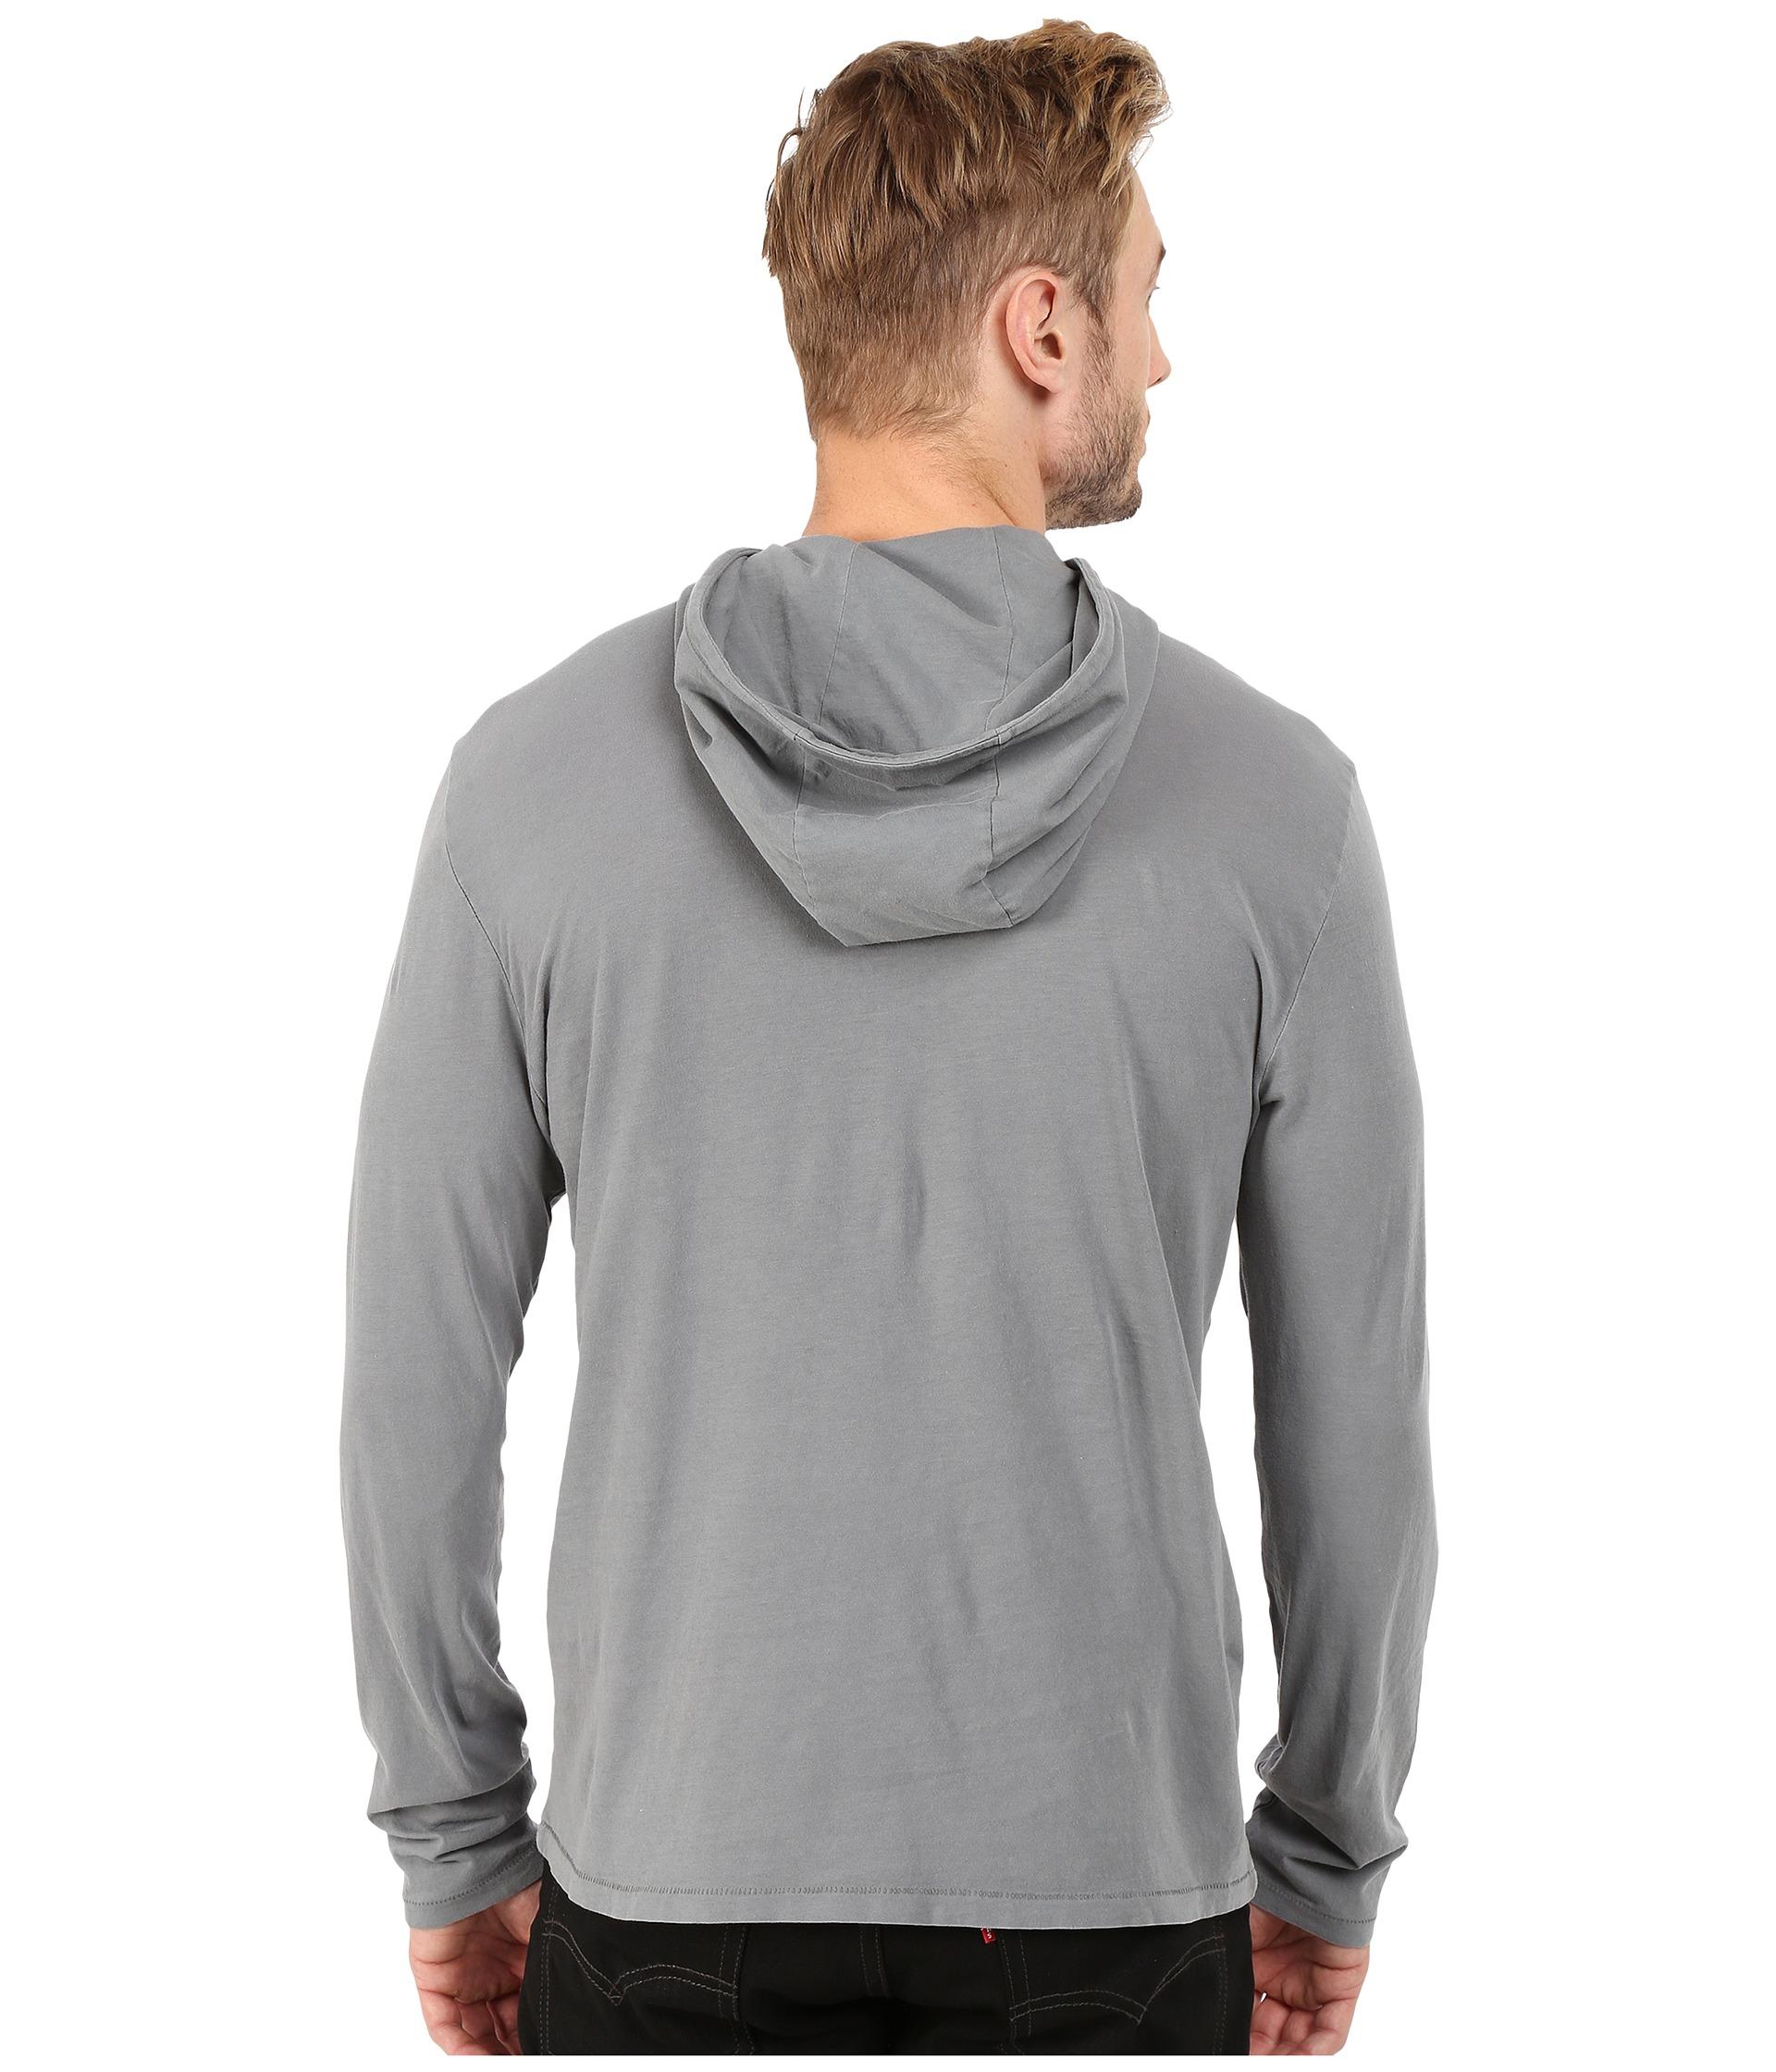 549510b55fd2 John Varvatos Rock Graphic Pullover Hoodie K2625r4b in Gray for Men ...